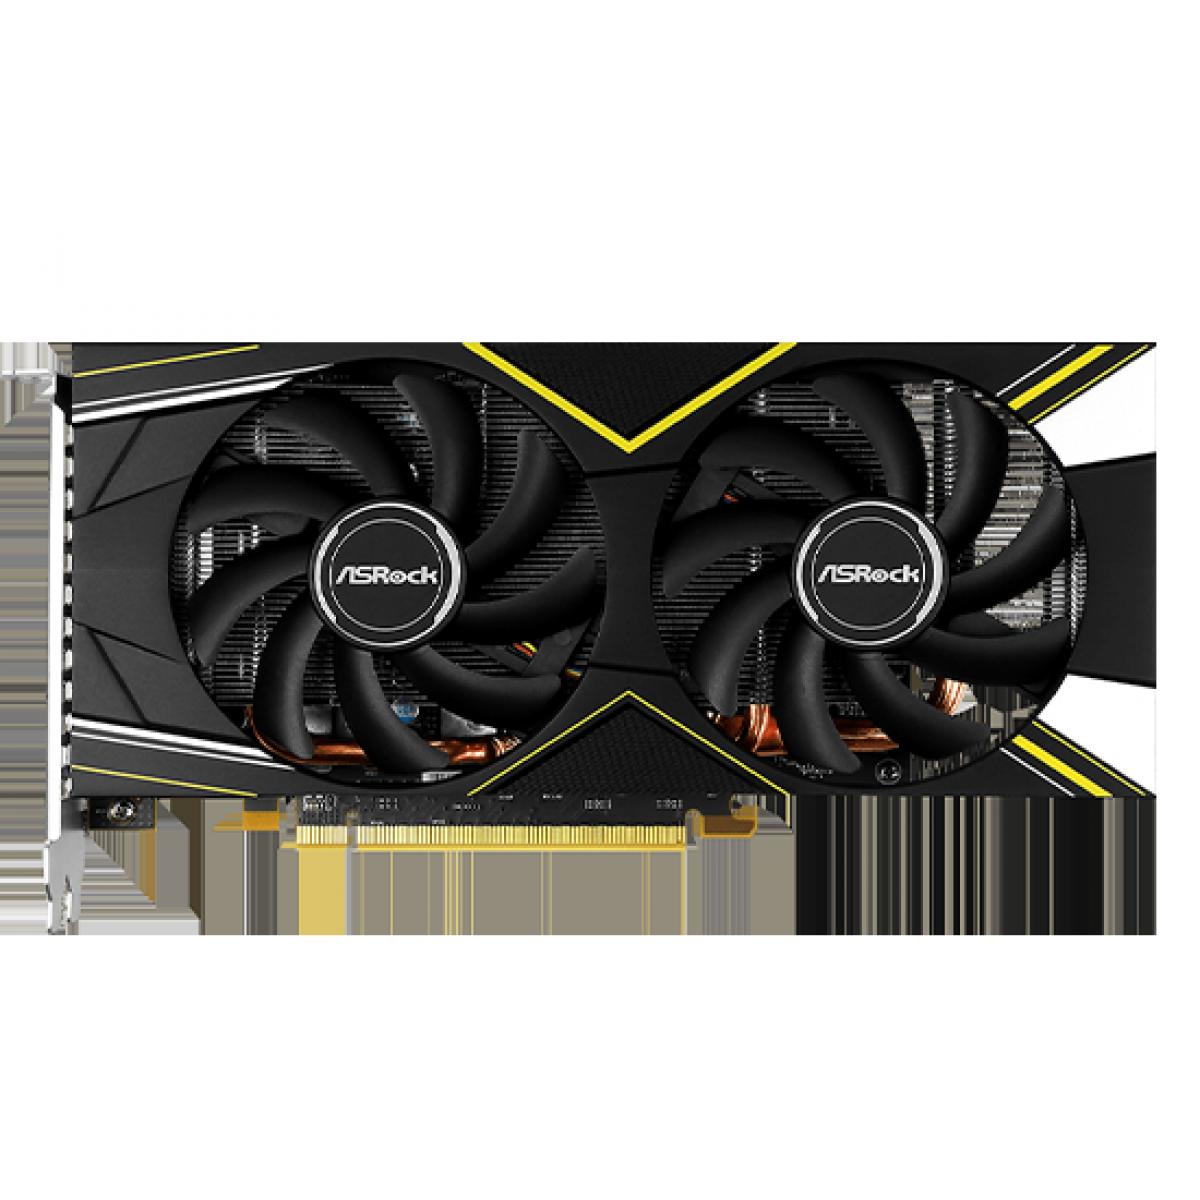 Placa de Vídeo Asrock Radeon Navi RX 5500 XT Challenger D OC, Dual Fan, 8GB GDDR6, 128Bit, 90-GA1LZZ-00UANF